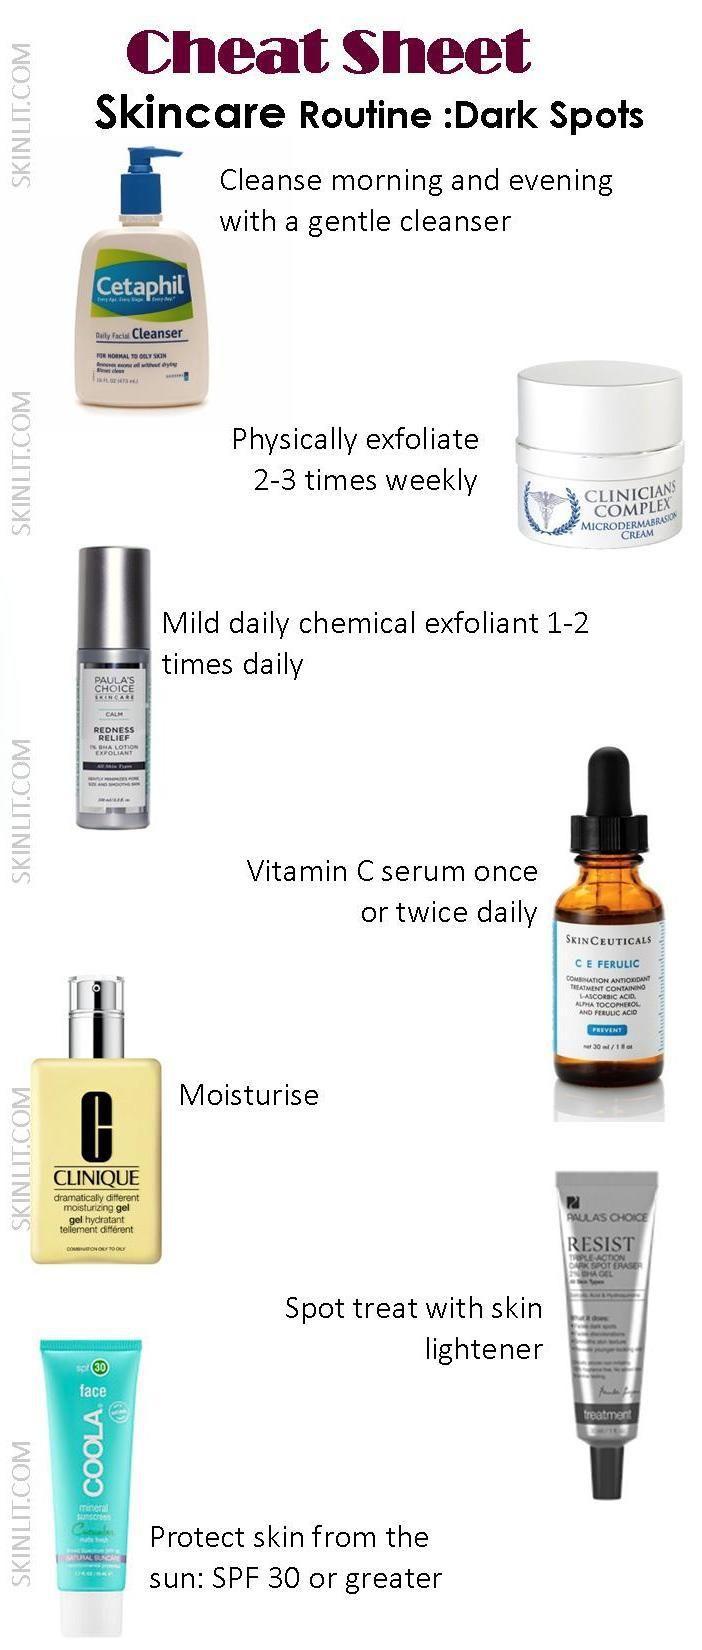 Cheat Sheet Treat Dark Spots Skinlit Effective Skin Care Products Acne Dark Spots Skin Care